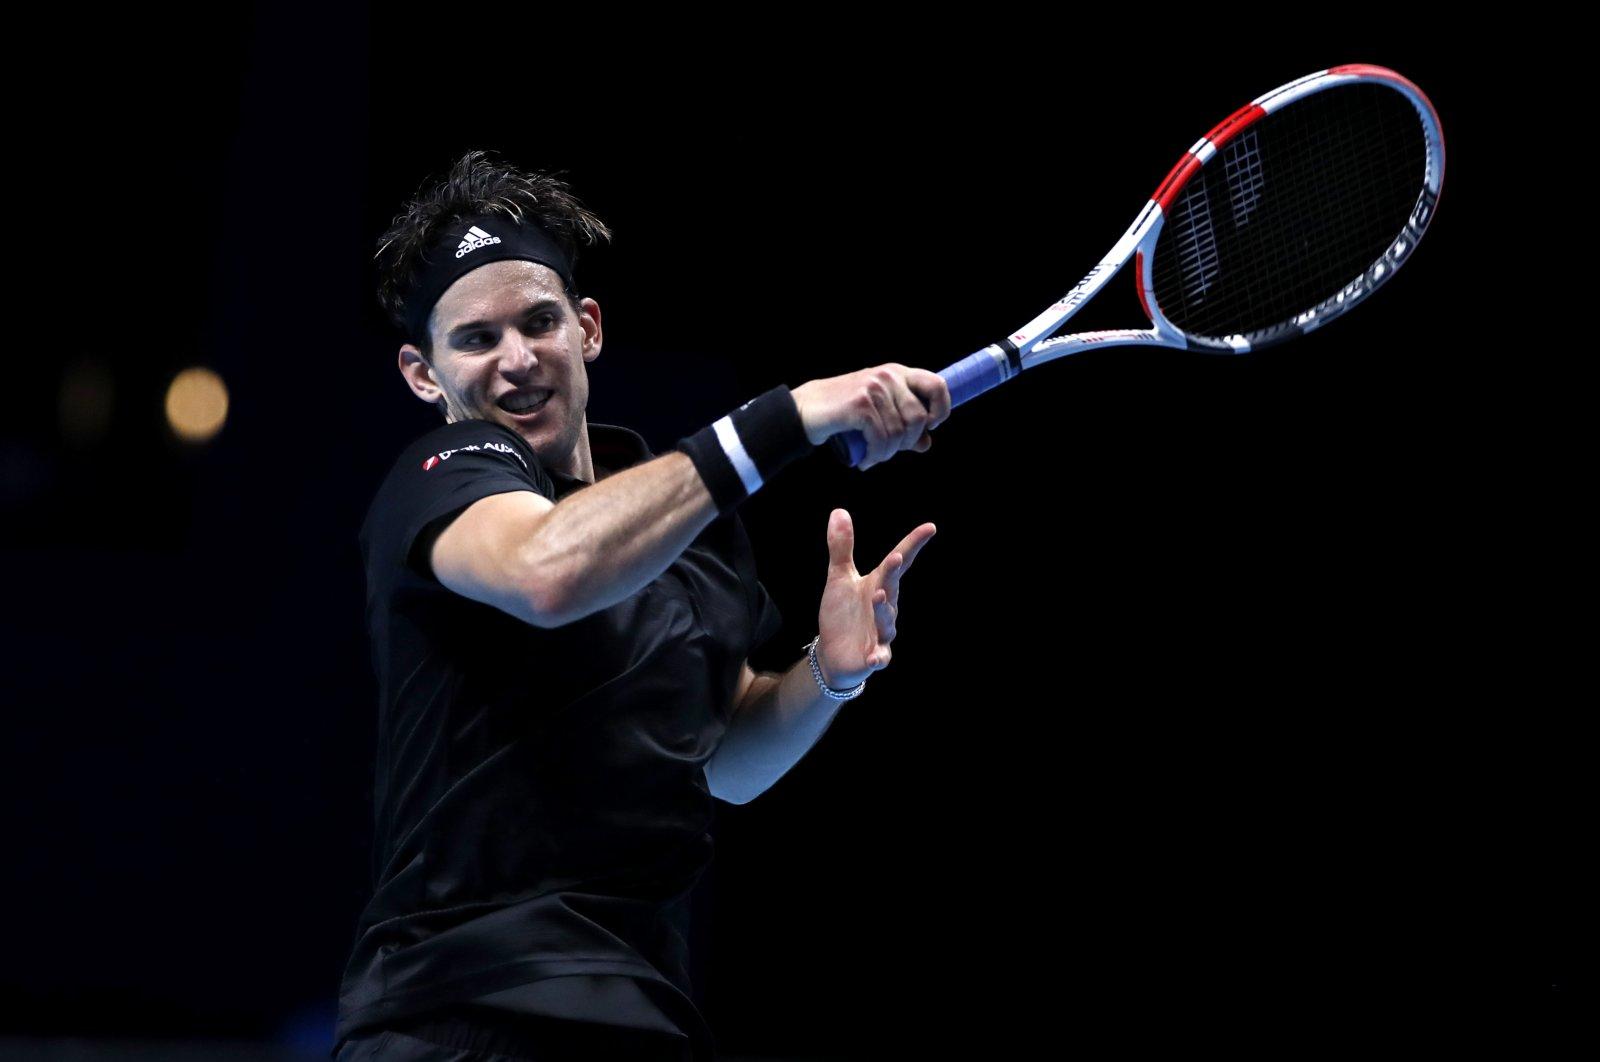 Dominic Thiem returns Rafael Nadal's shot during an ATP Masters tennis match in London, Britain, Nov. 17, 2020. (Reuters Photo)